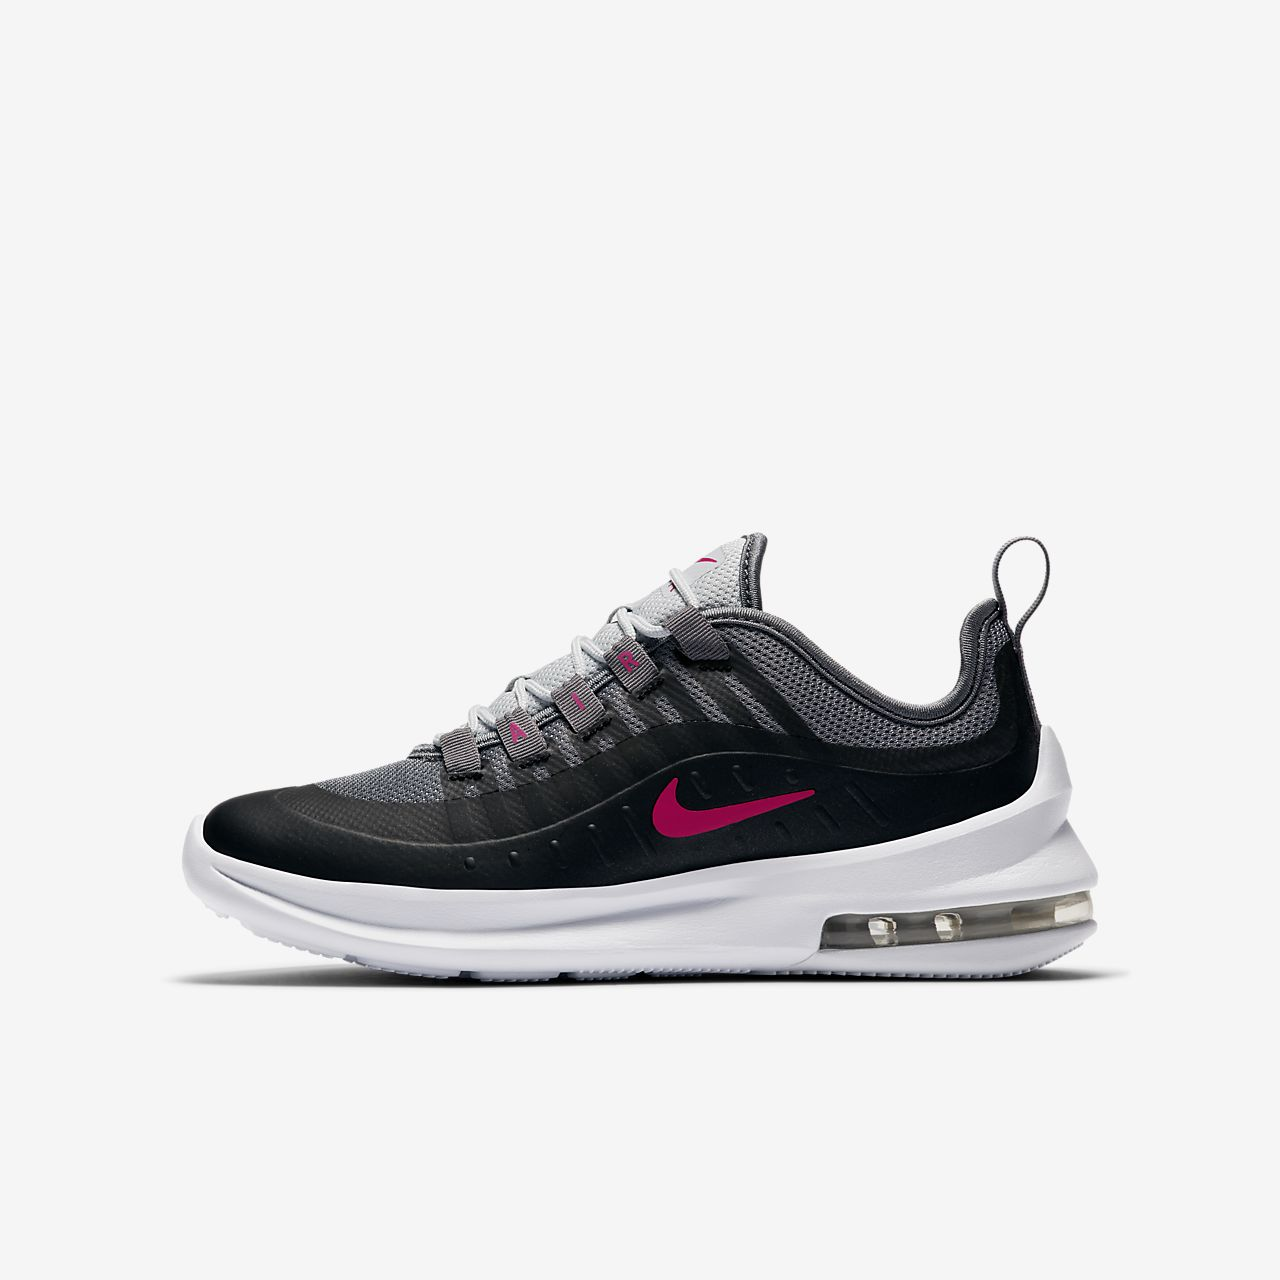 Nike Air Max Axis Beyaz Siyah Erkek Koşu Ayakkabısı